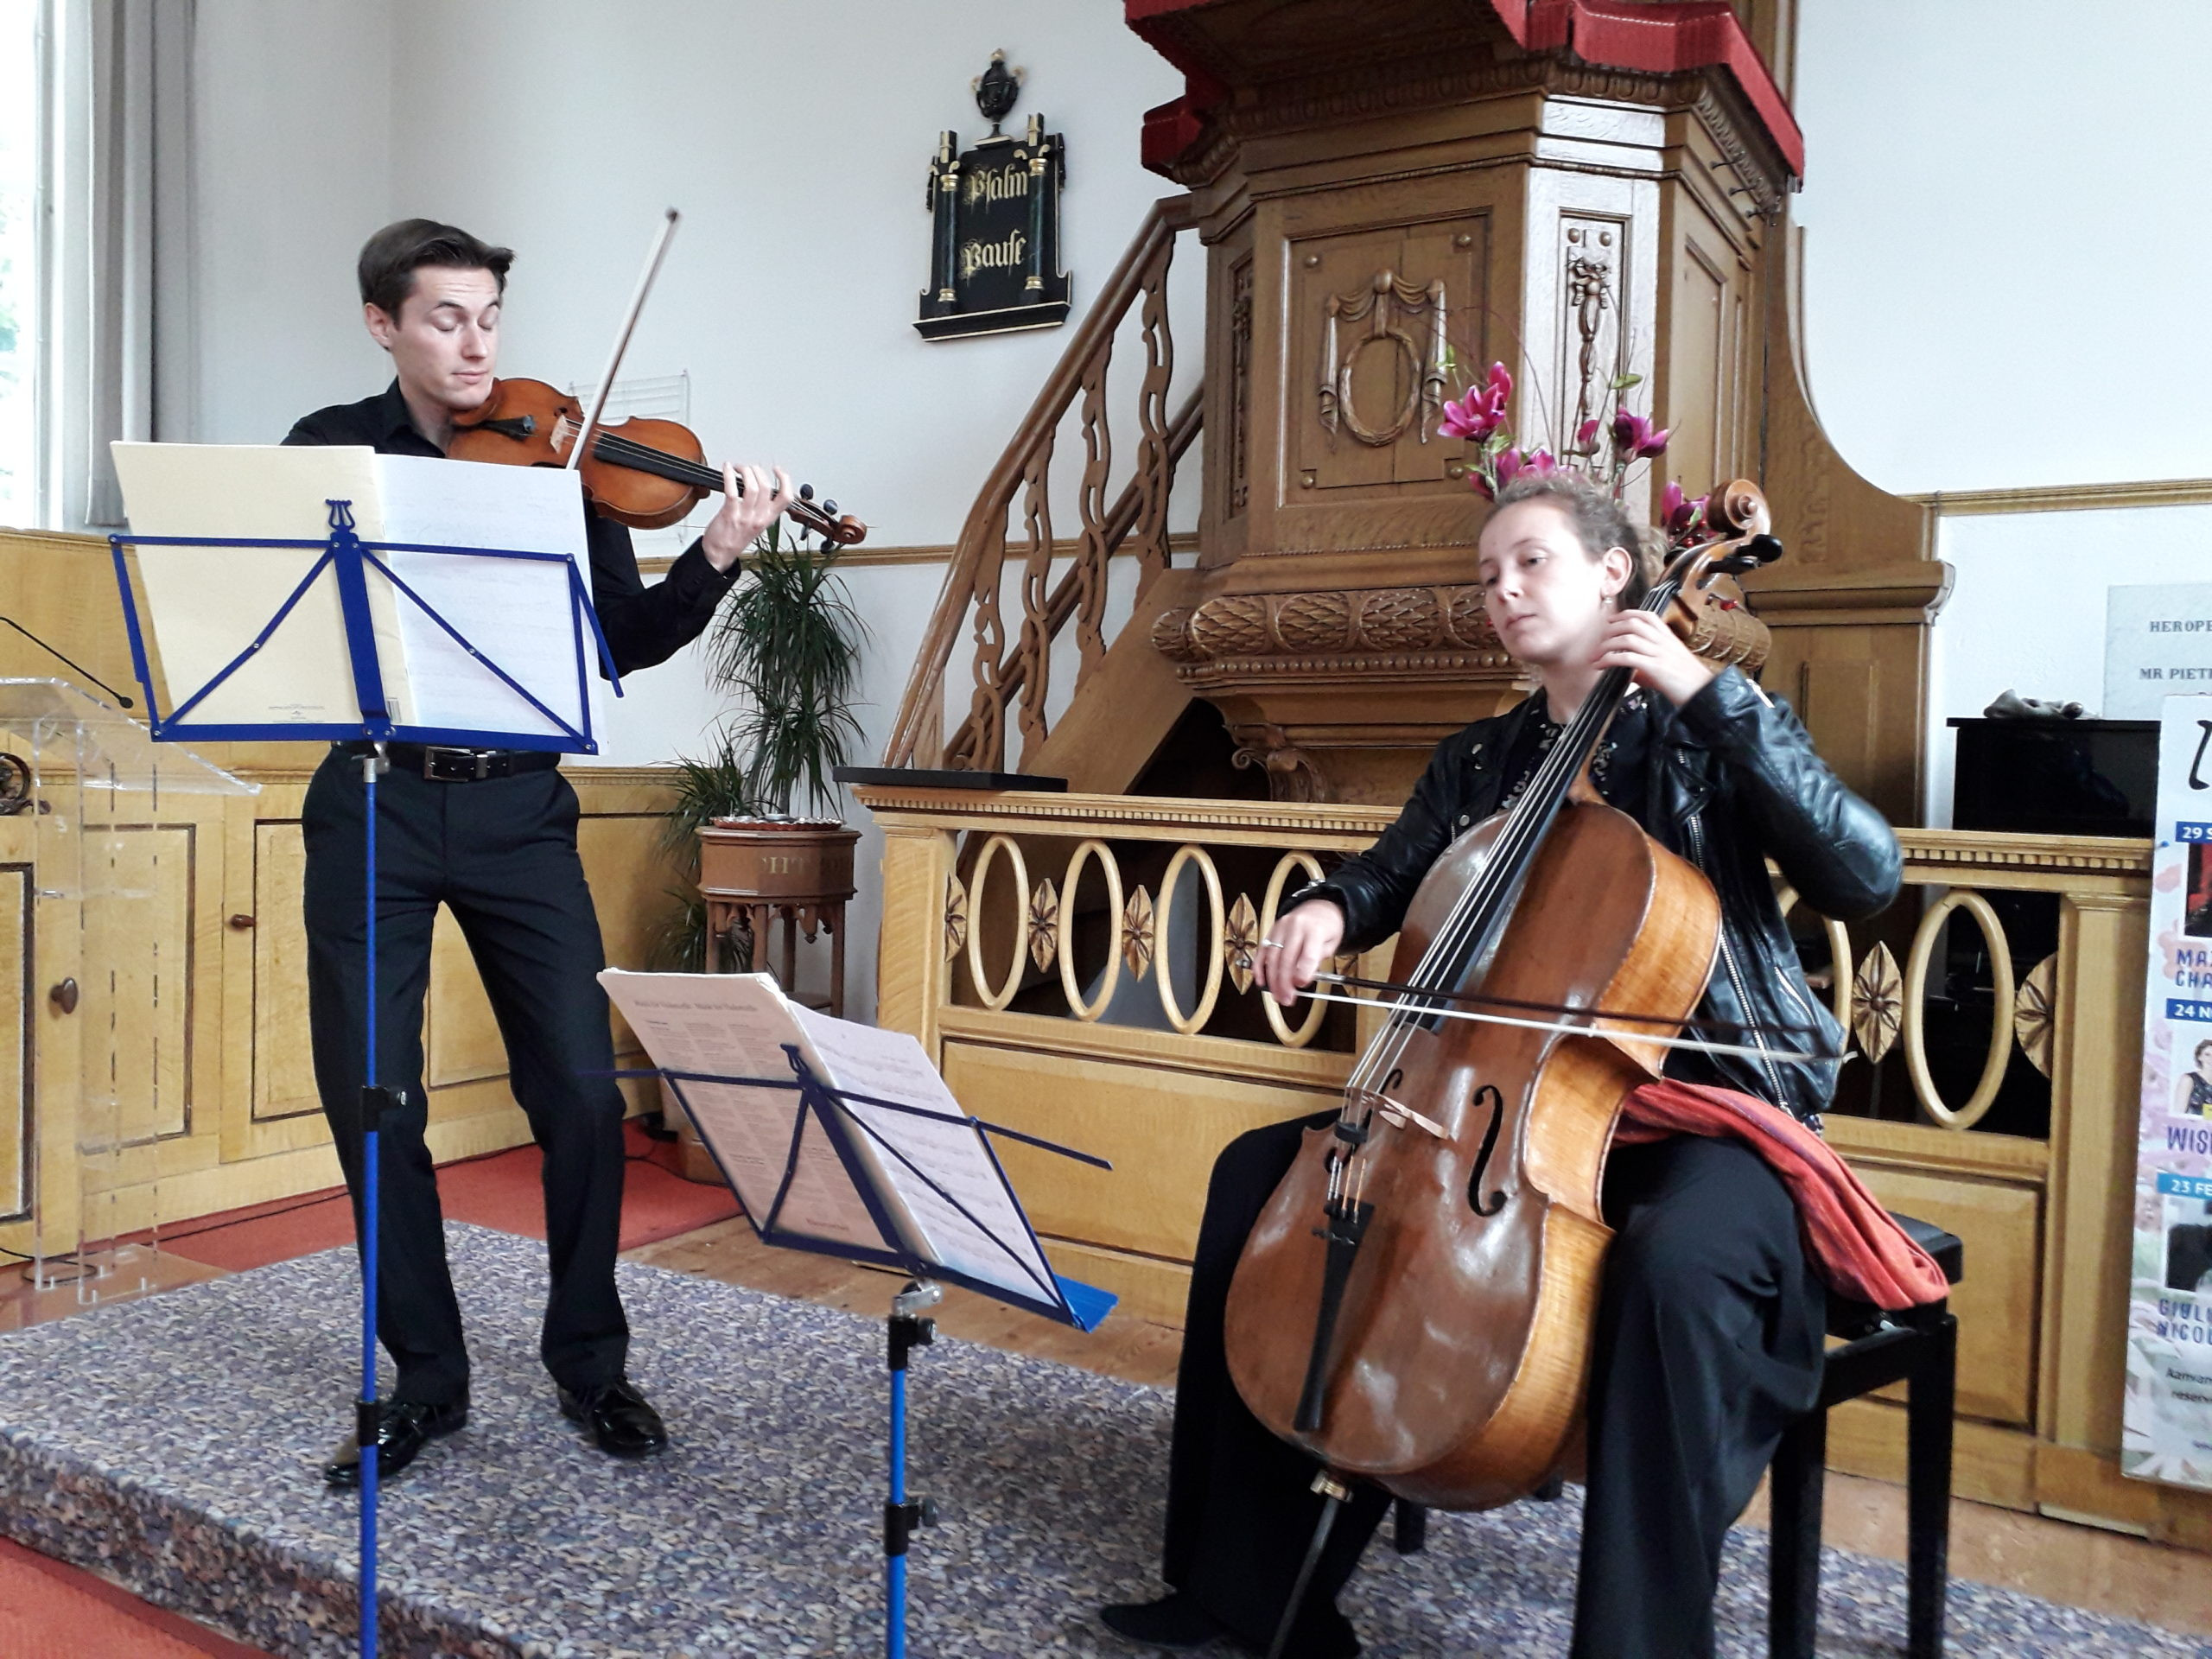 Maxime en Charlotte, Waddinxveen